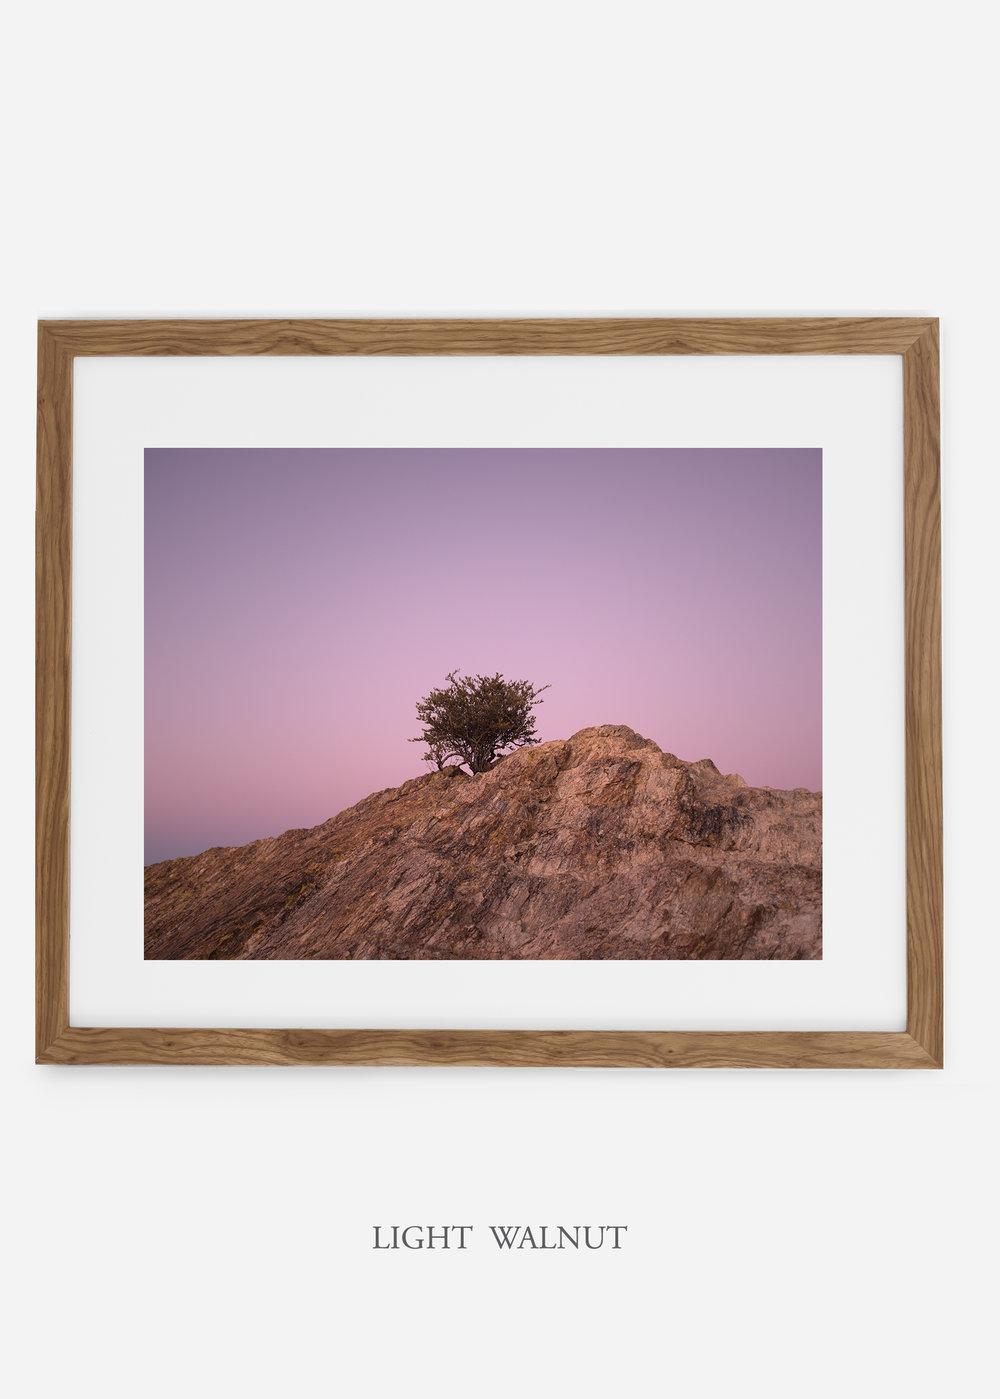 lightwalnutframe-saguaroNo.11-wildercalifornia-art-wallart-cactusprint-homedecor-prints-arizona-botanical-artwork-interiordesign.jpg